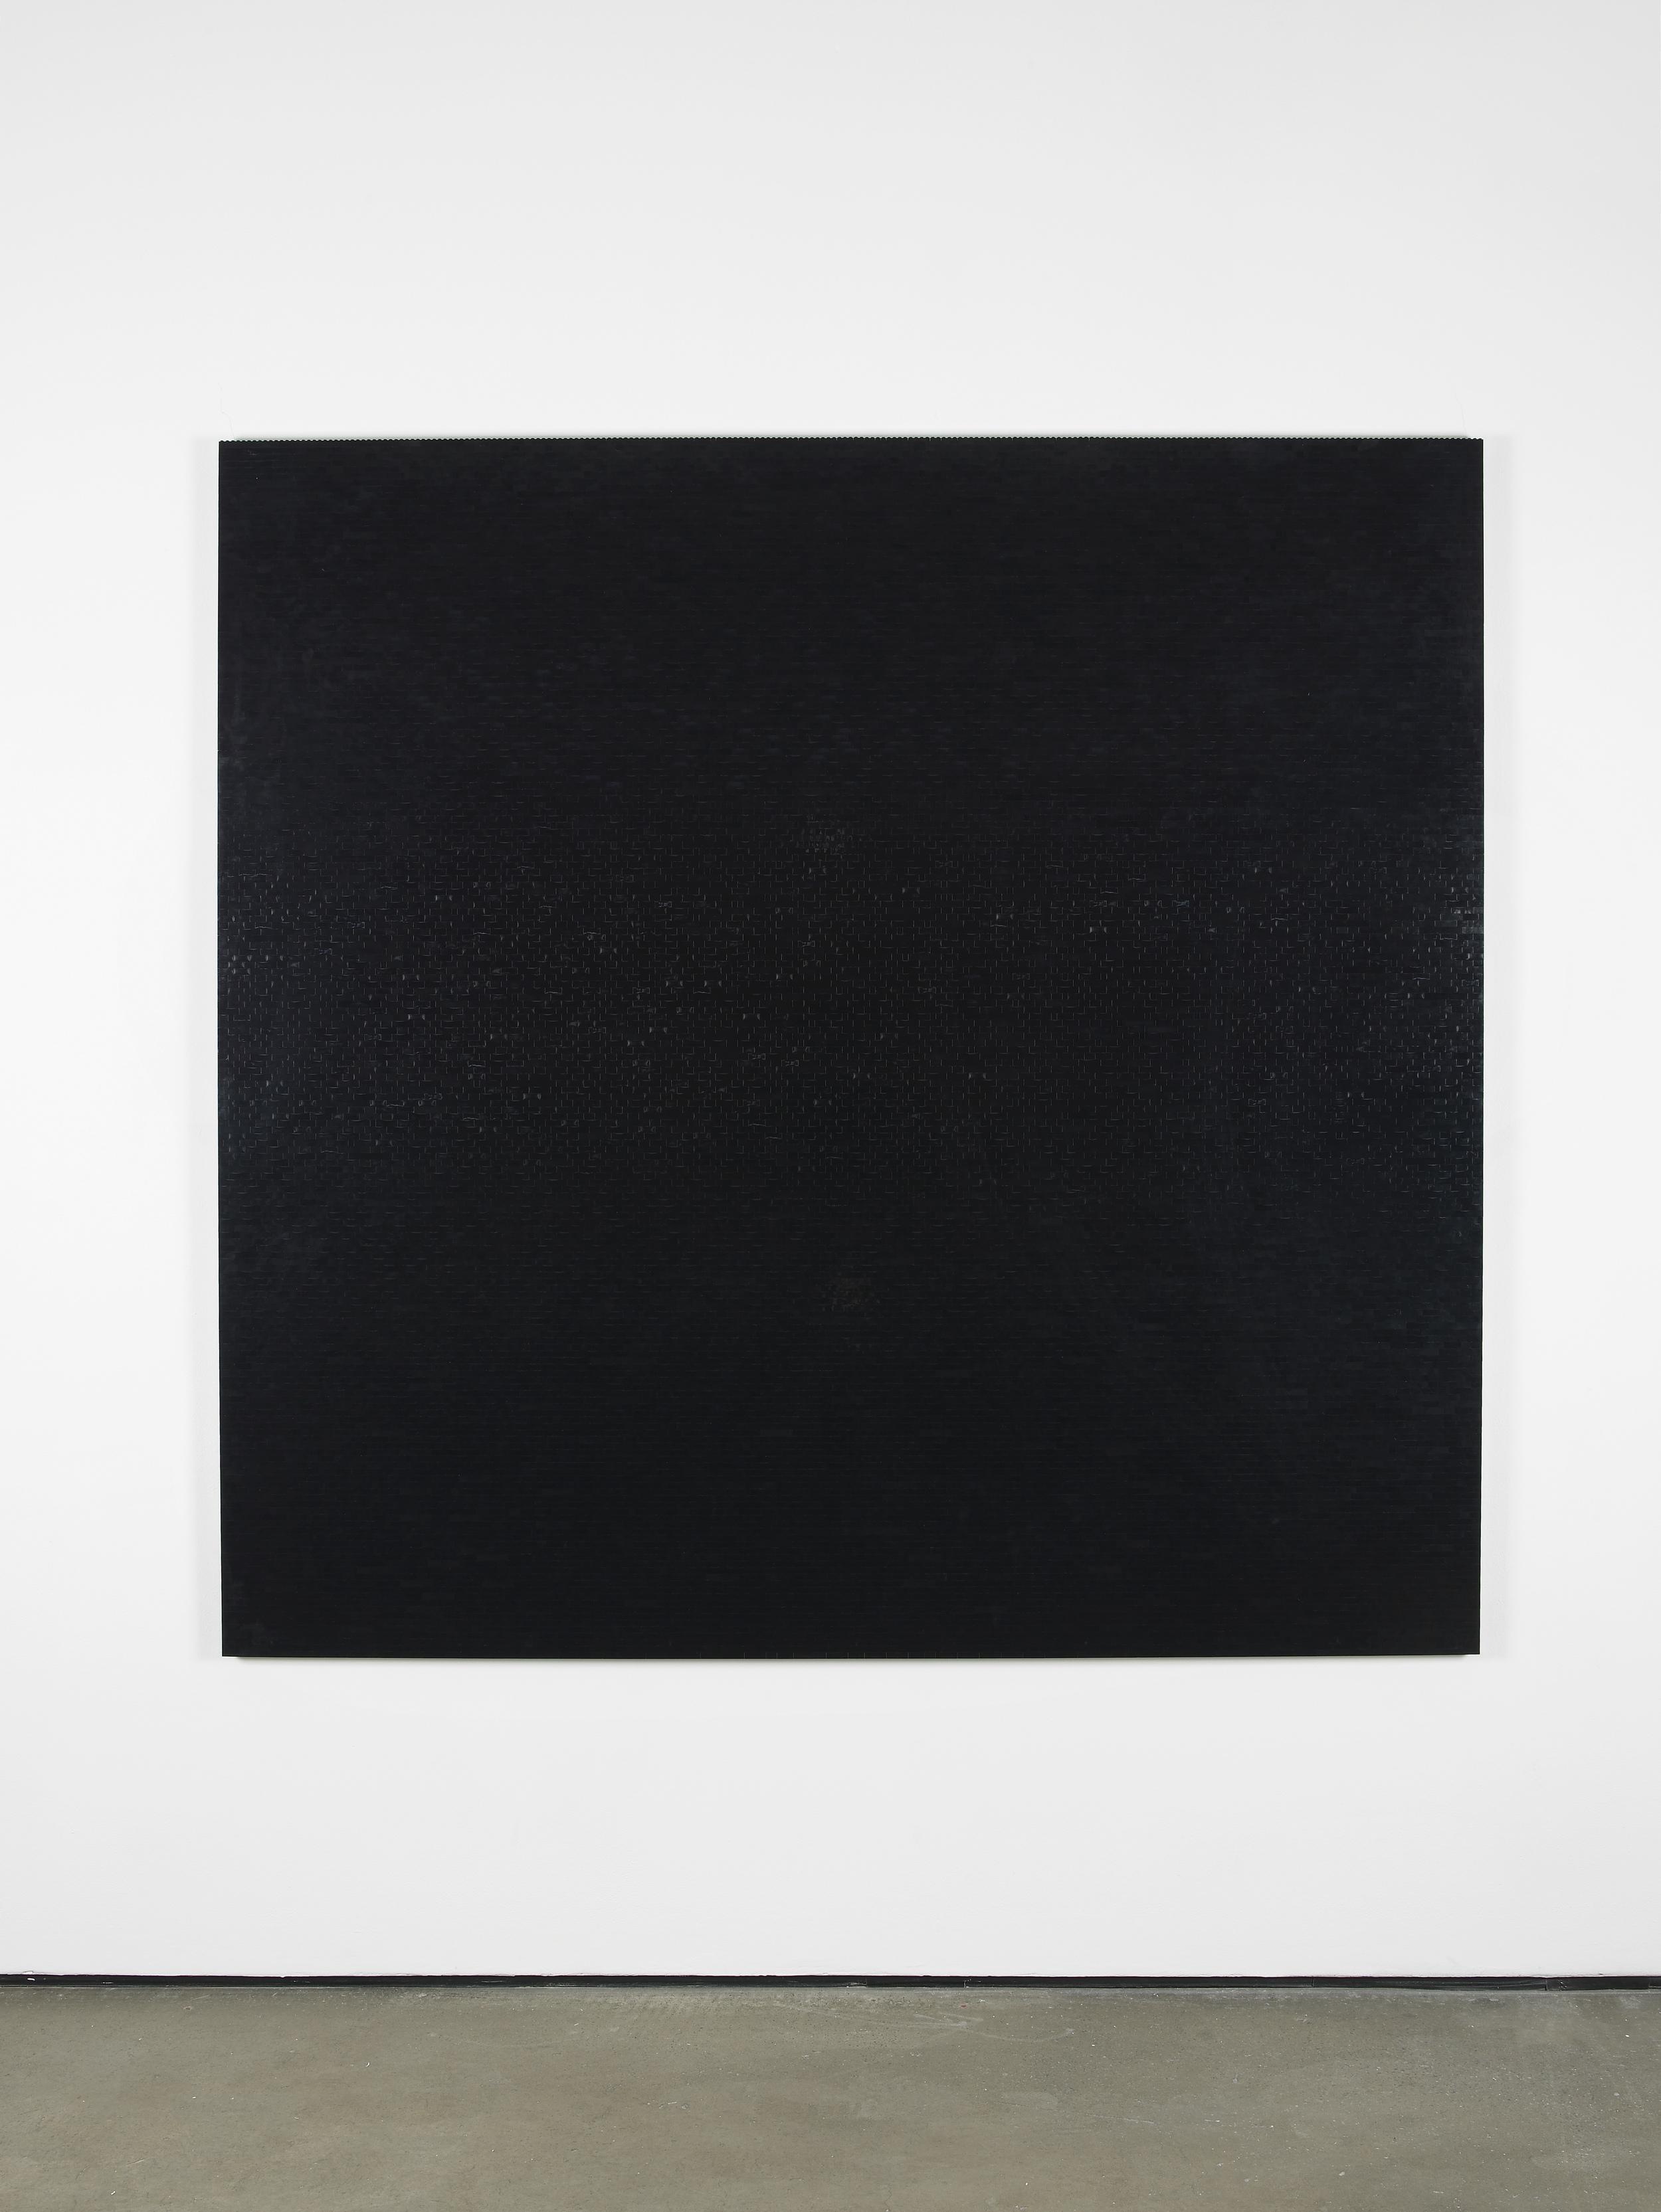 Michael Wilkinson Black Wall 7 2013 Black lego, wooden frame 185 x 185 x 3 cm / 72.8 x 72.8 x 1.1 in